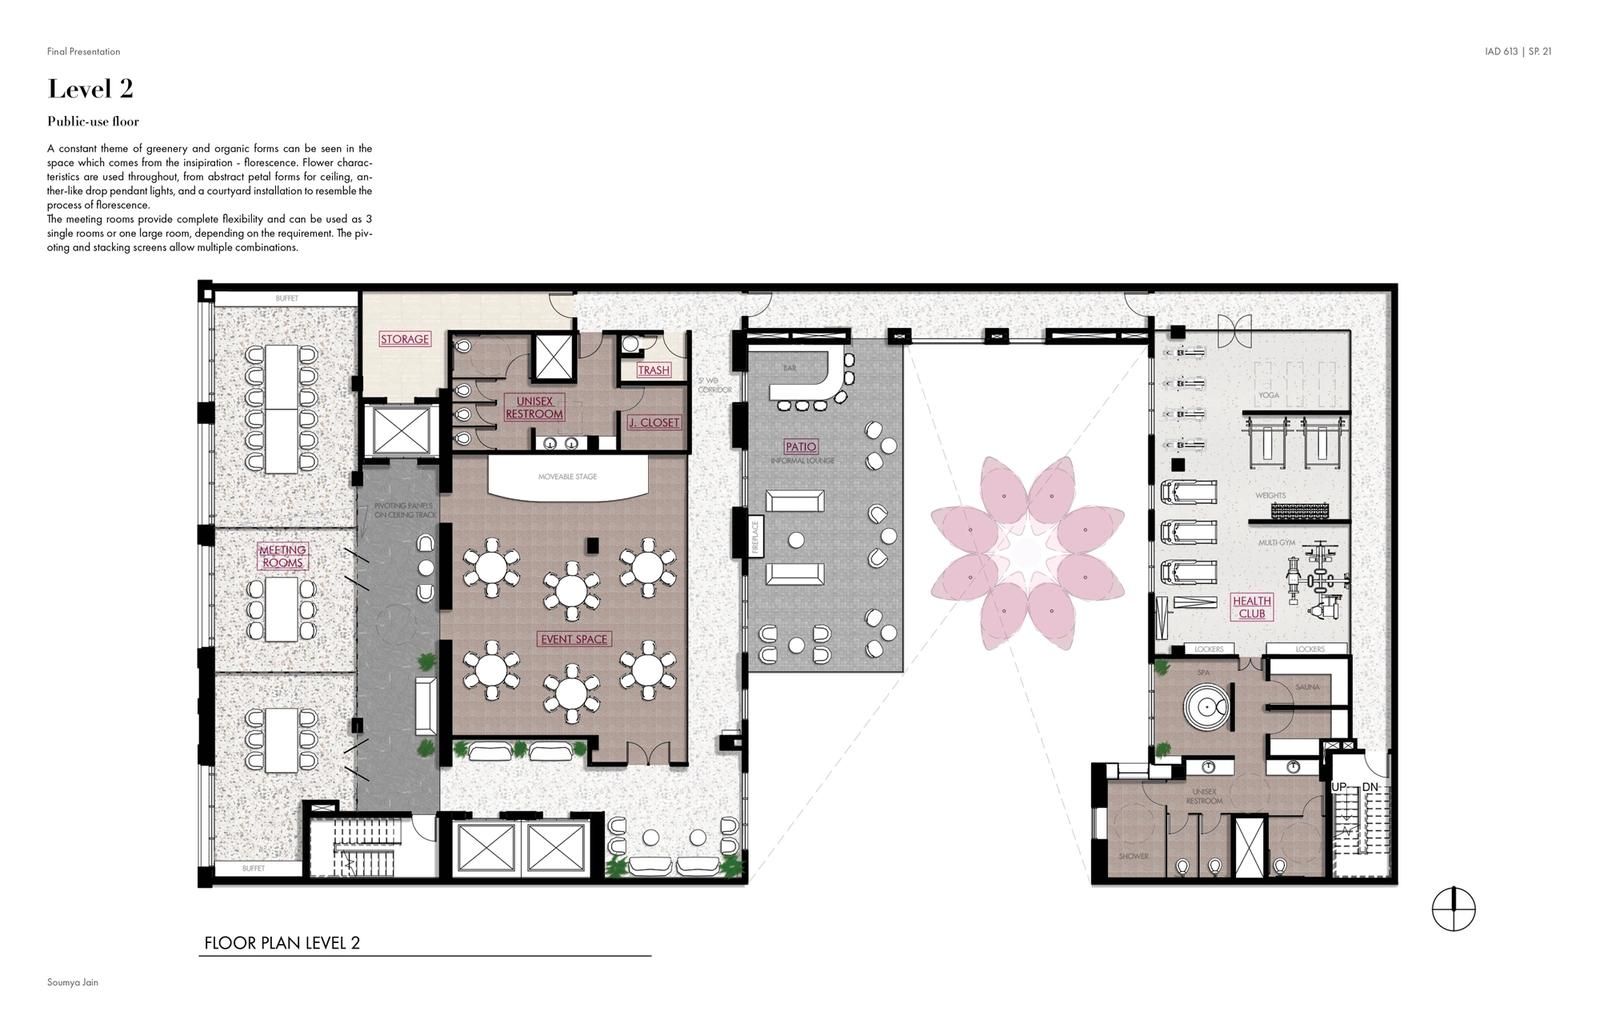 Hotel Florescence - Level 2